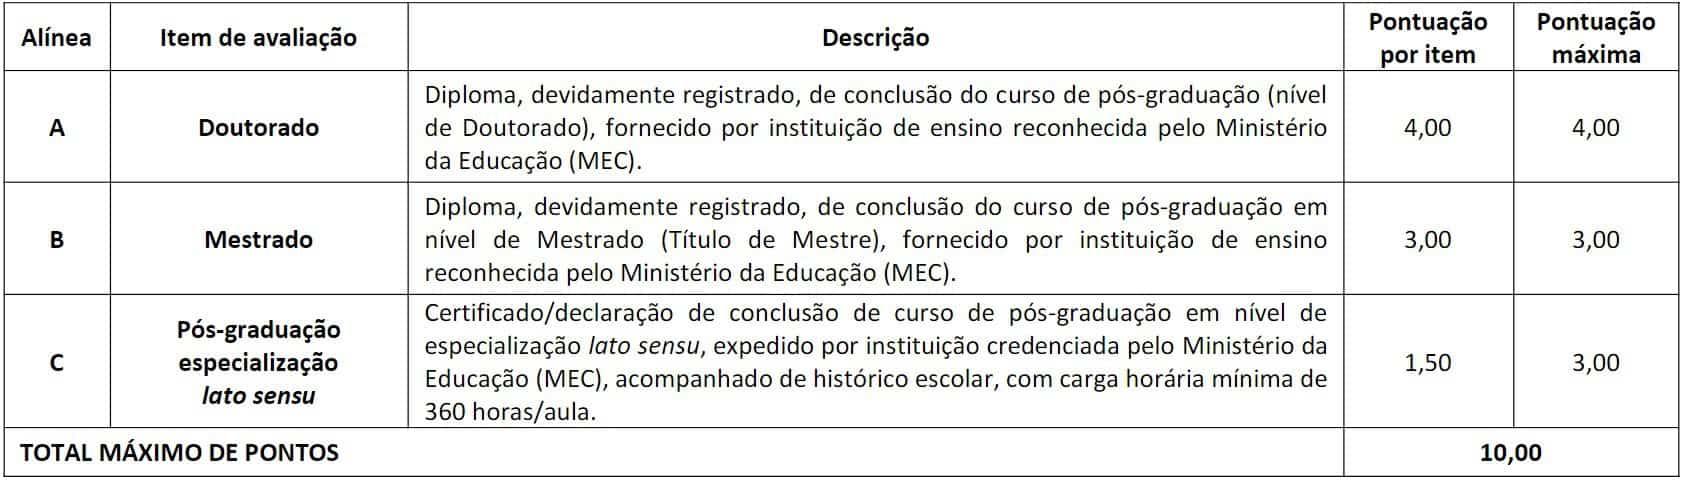 pt3 4 - Concurso CRP MS 2020: Provas Marcadas pro dia 07/03/2021 !